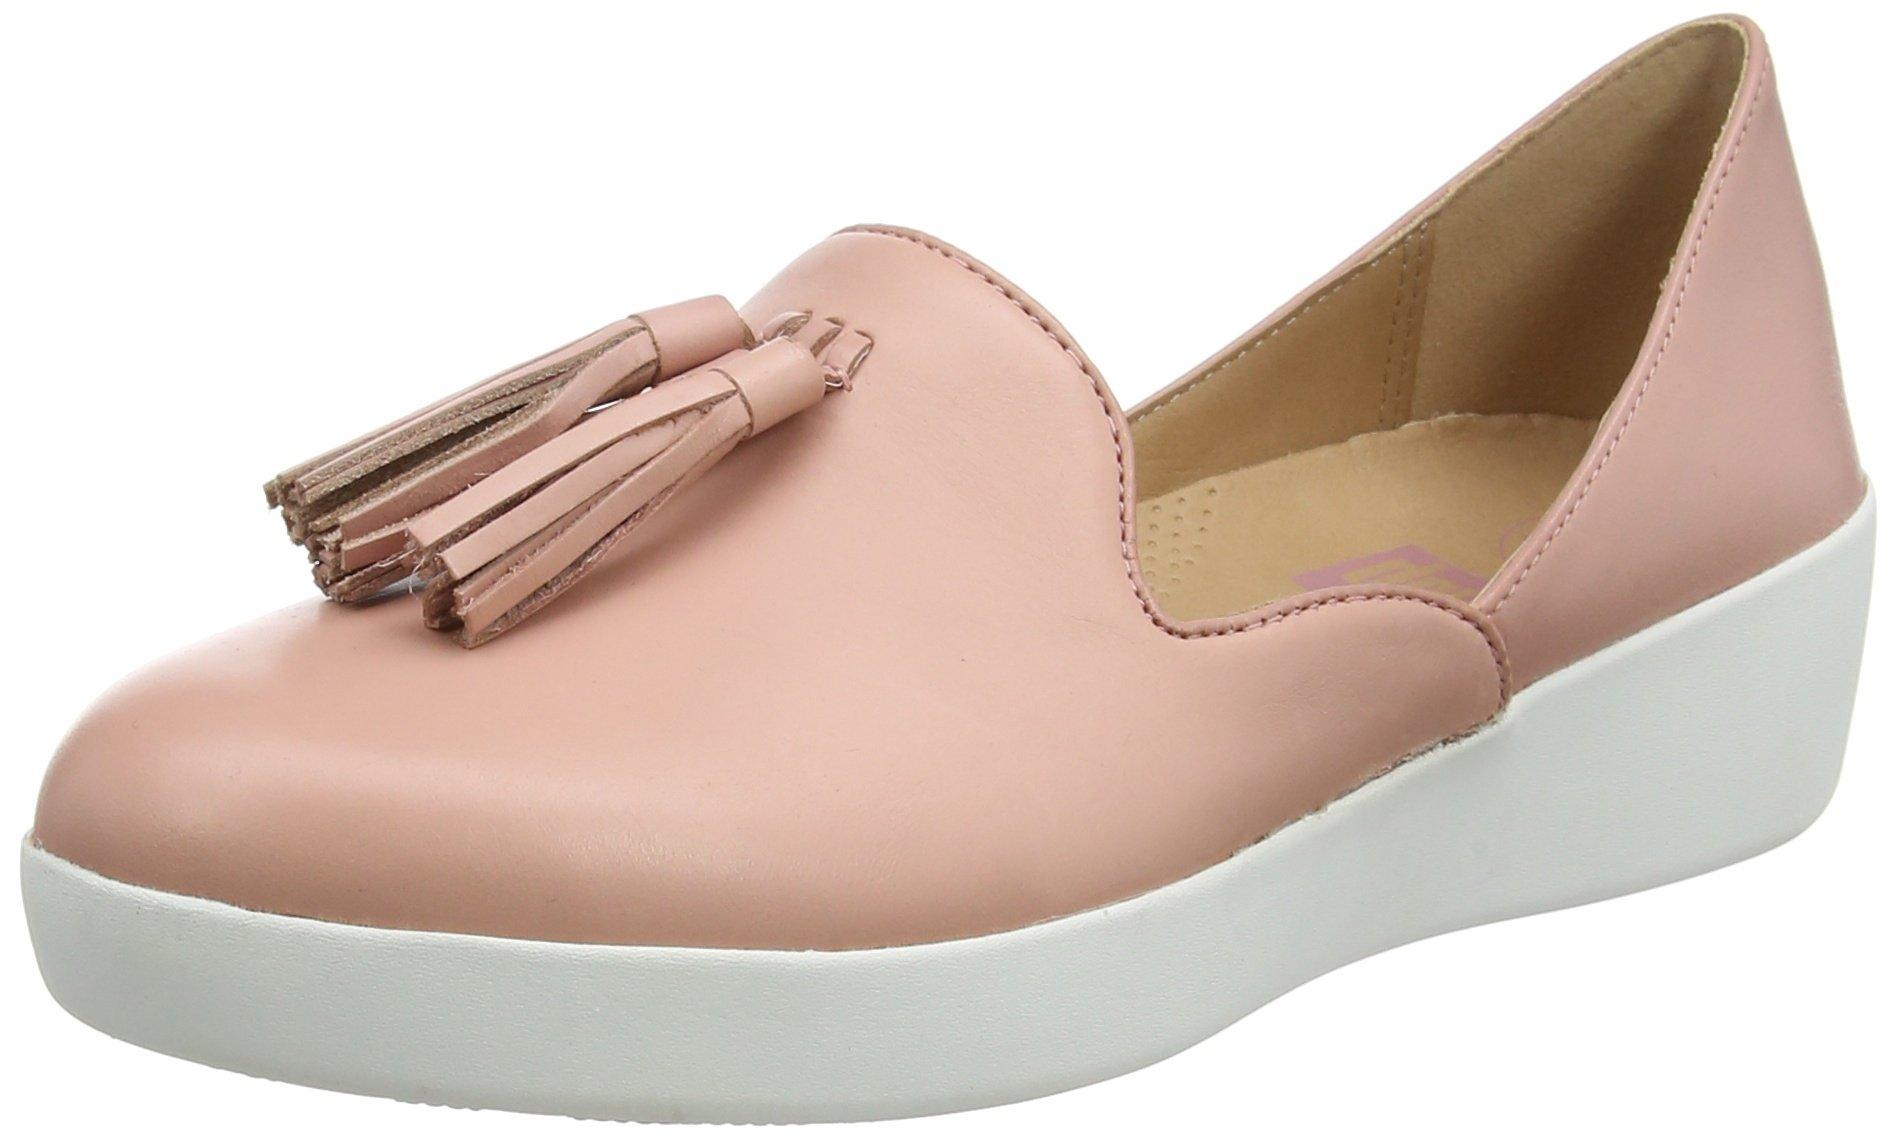 LoafersMocassins FemmeRosedusky 53536 Fitflop D'orsay Pink Superskate Tassel Eu J3lFKcT1